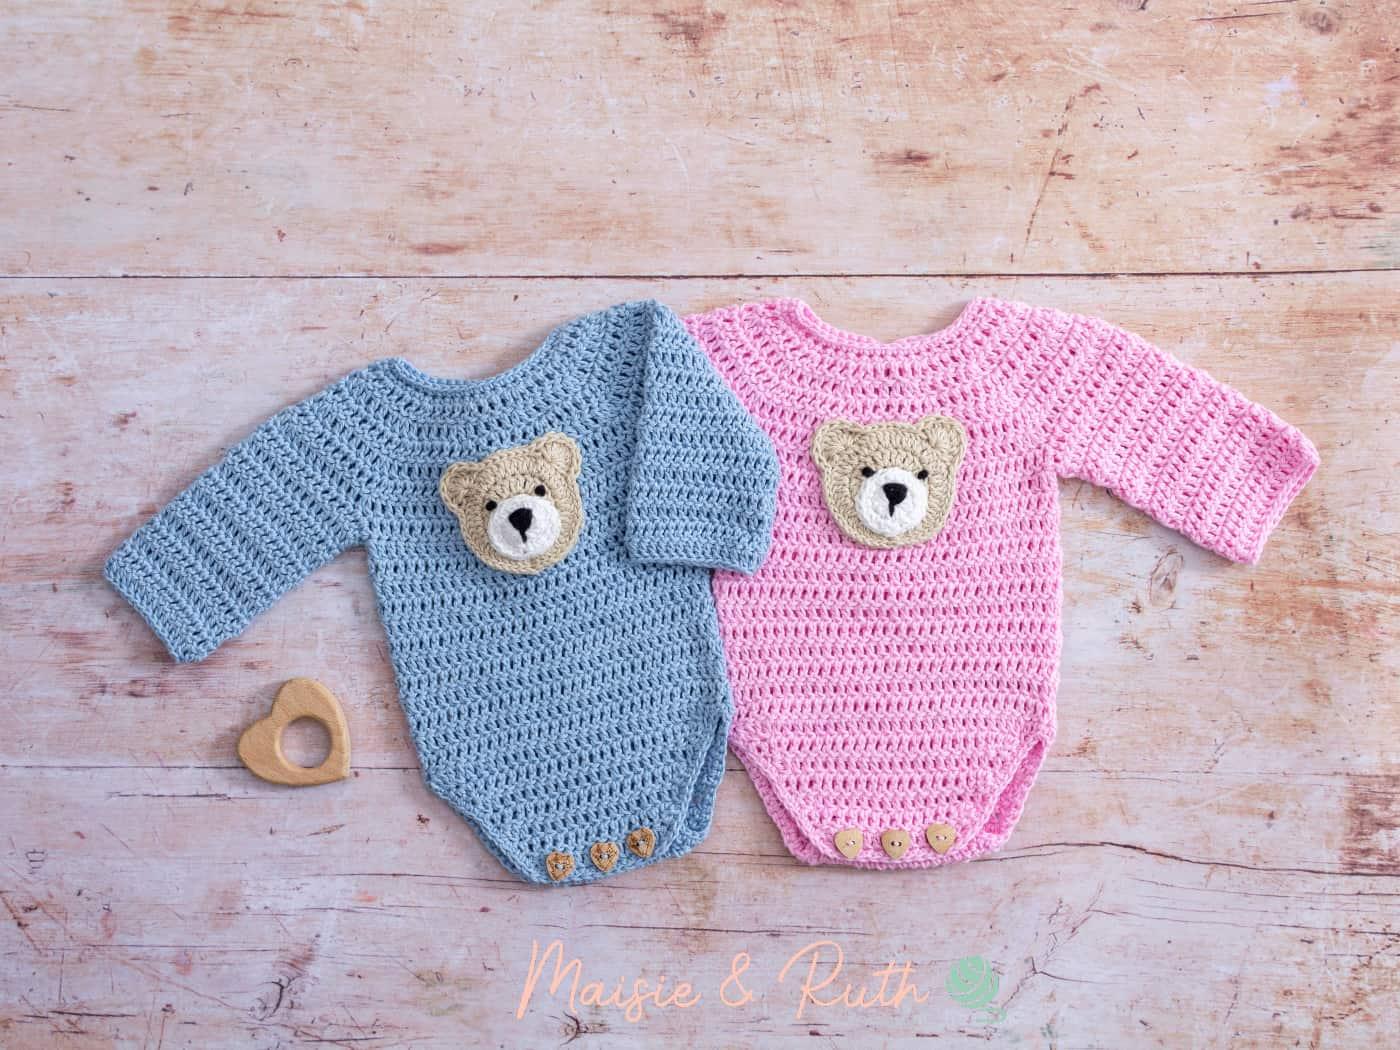 Crochet Baby Onesie Pattern Blue & Pink Versions